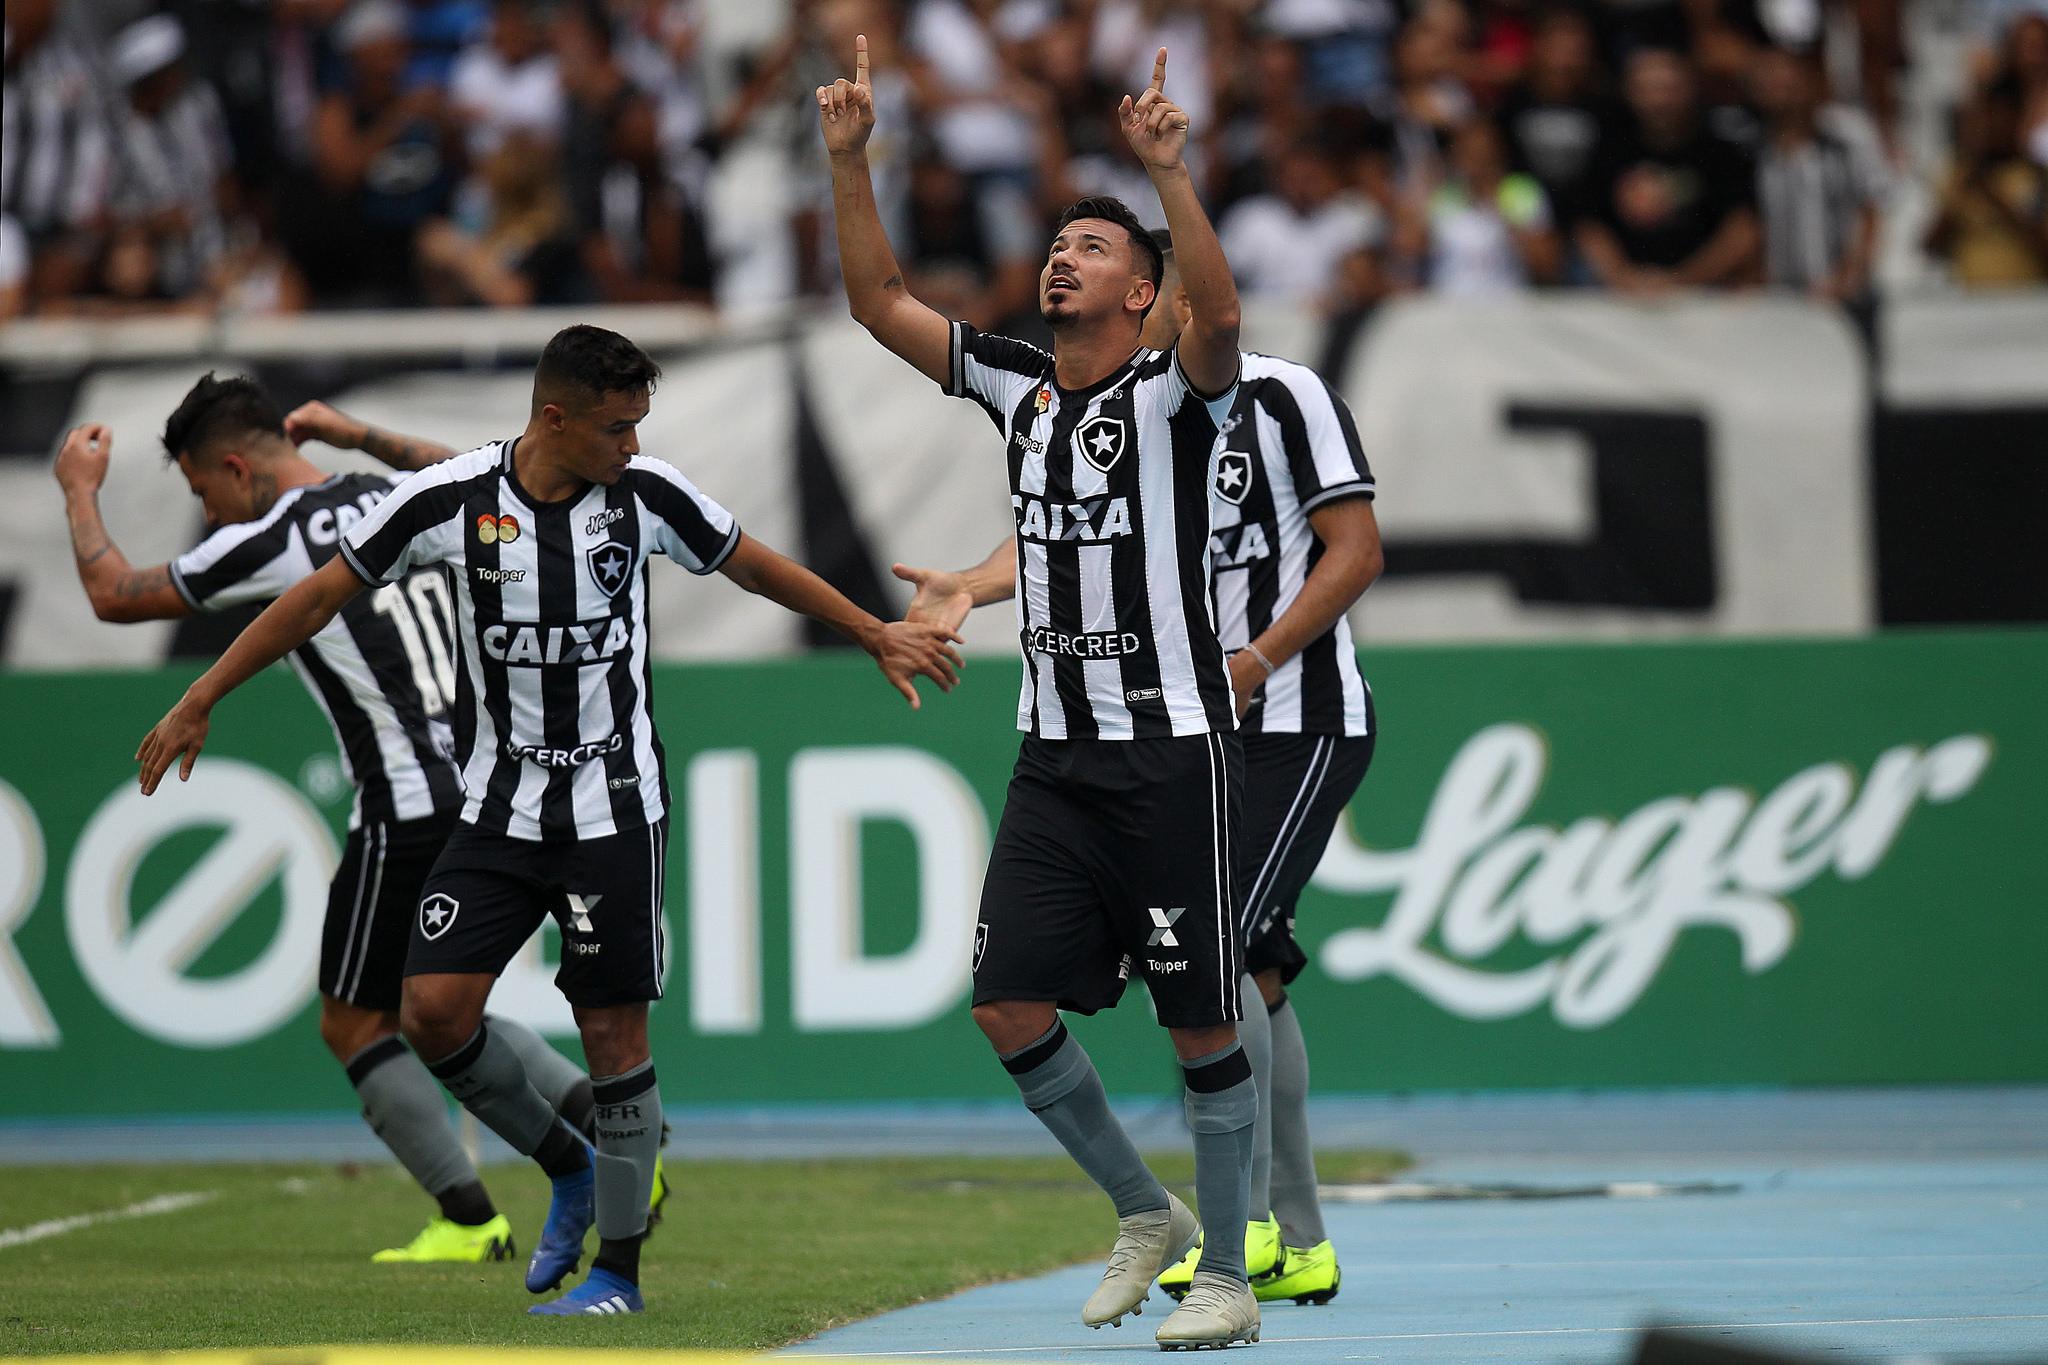 Foto: Vitor Silva - SSPress - Botafogo